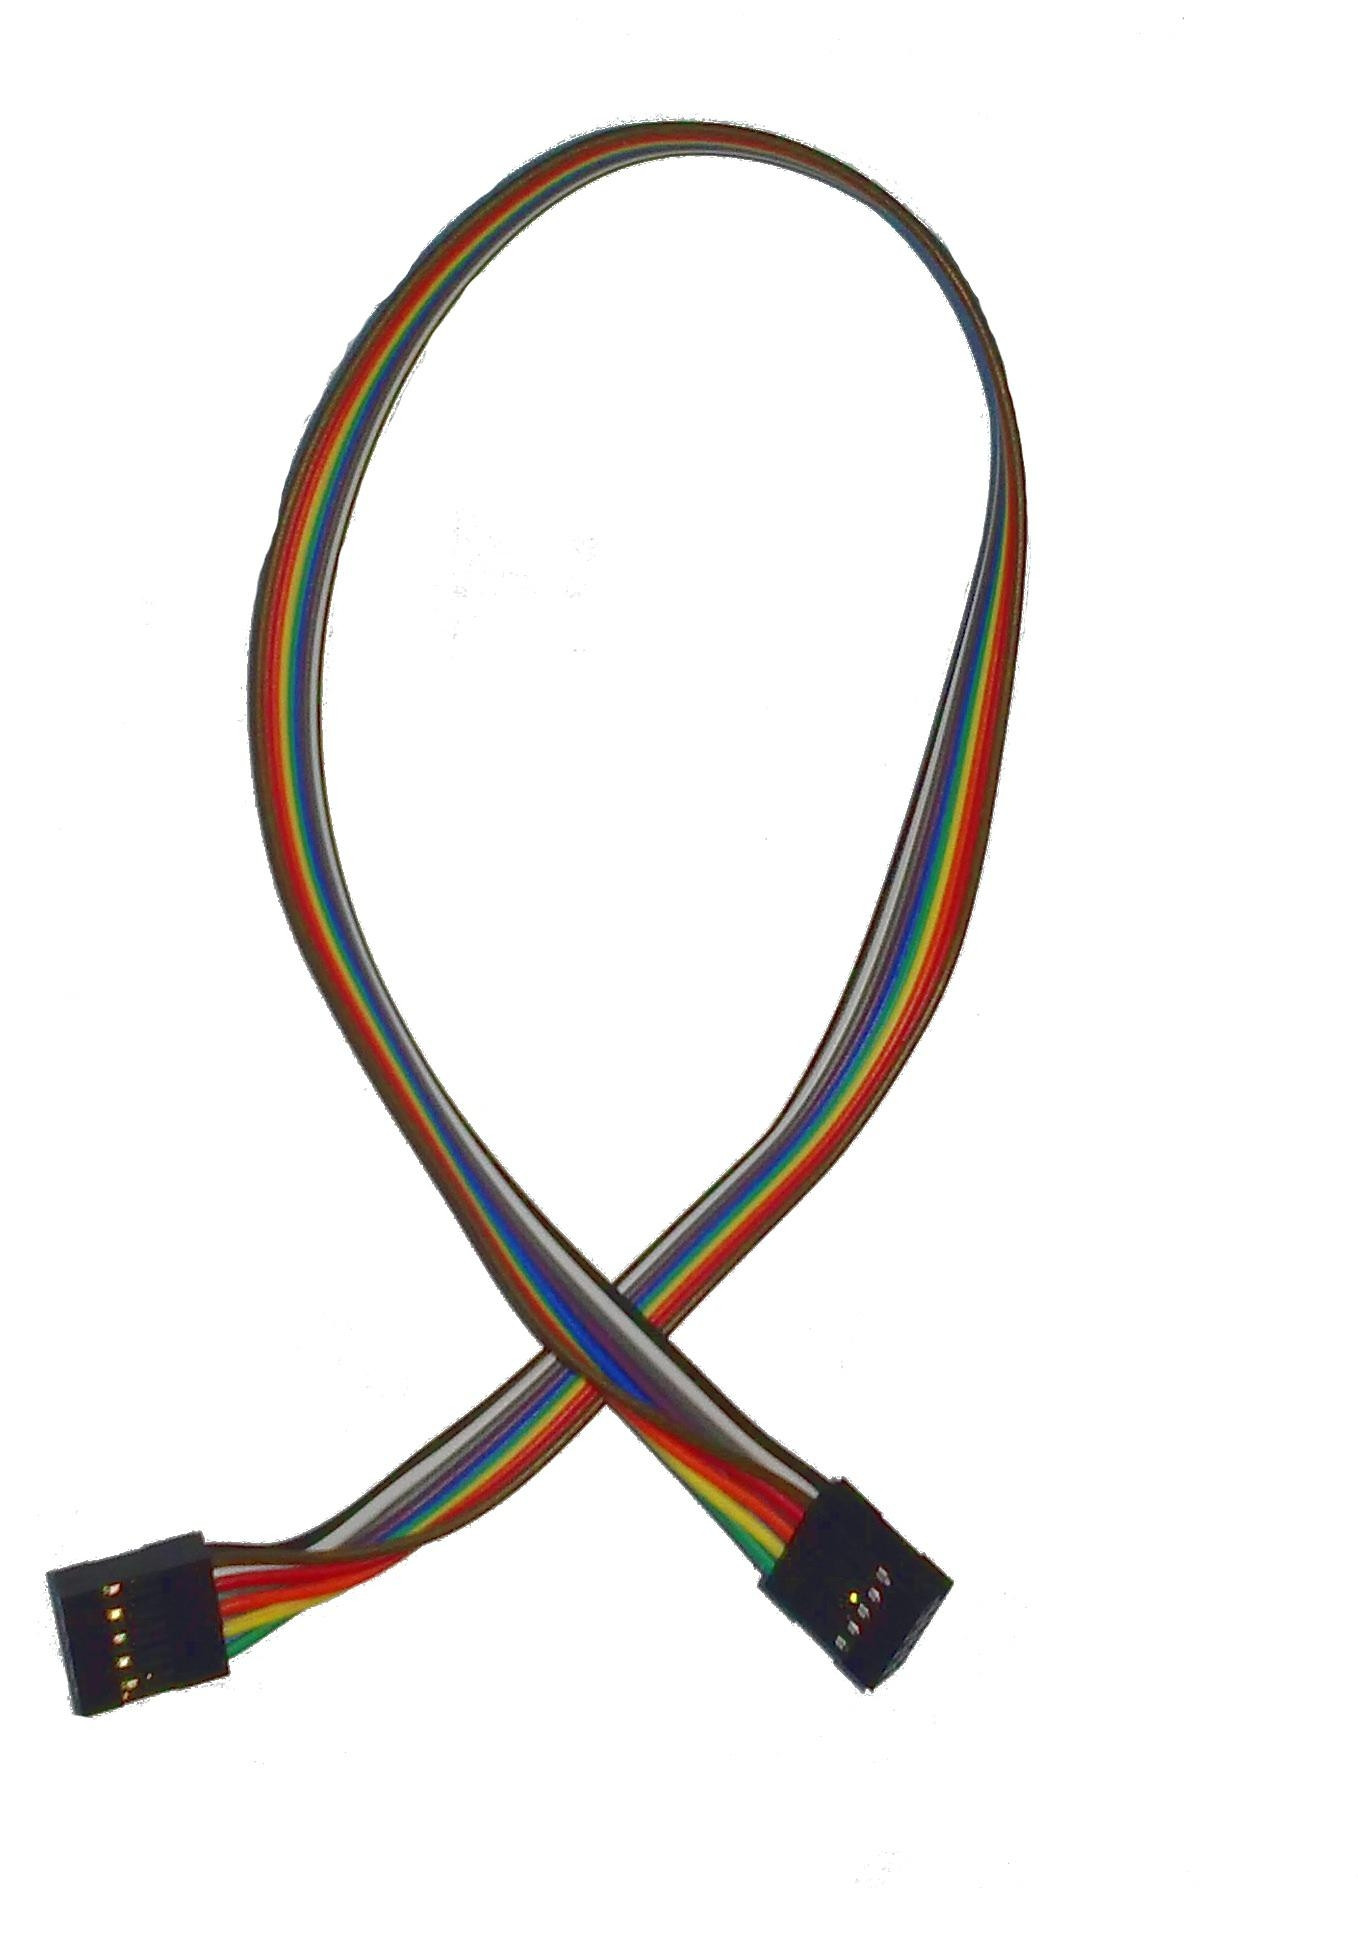 Kabel taśma żeński 2x5PIN x 2 l=40cm